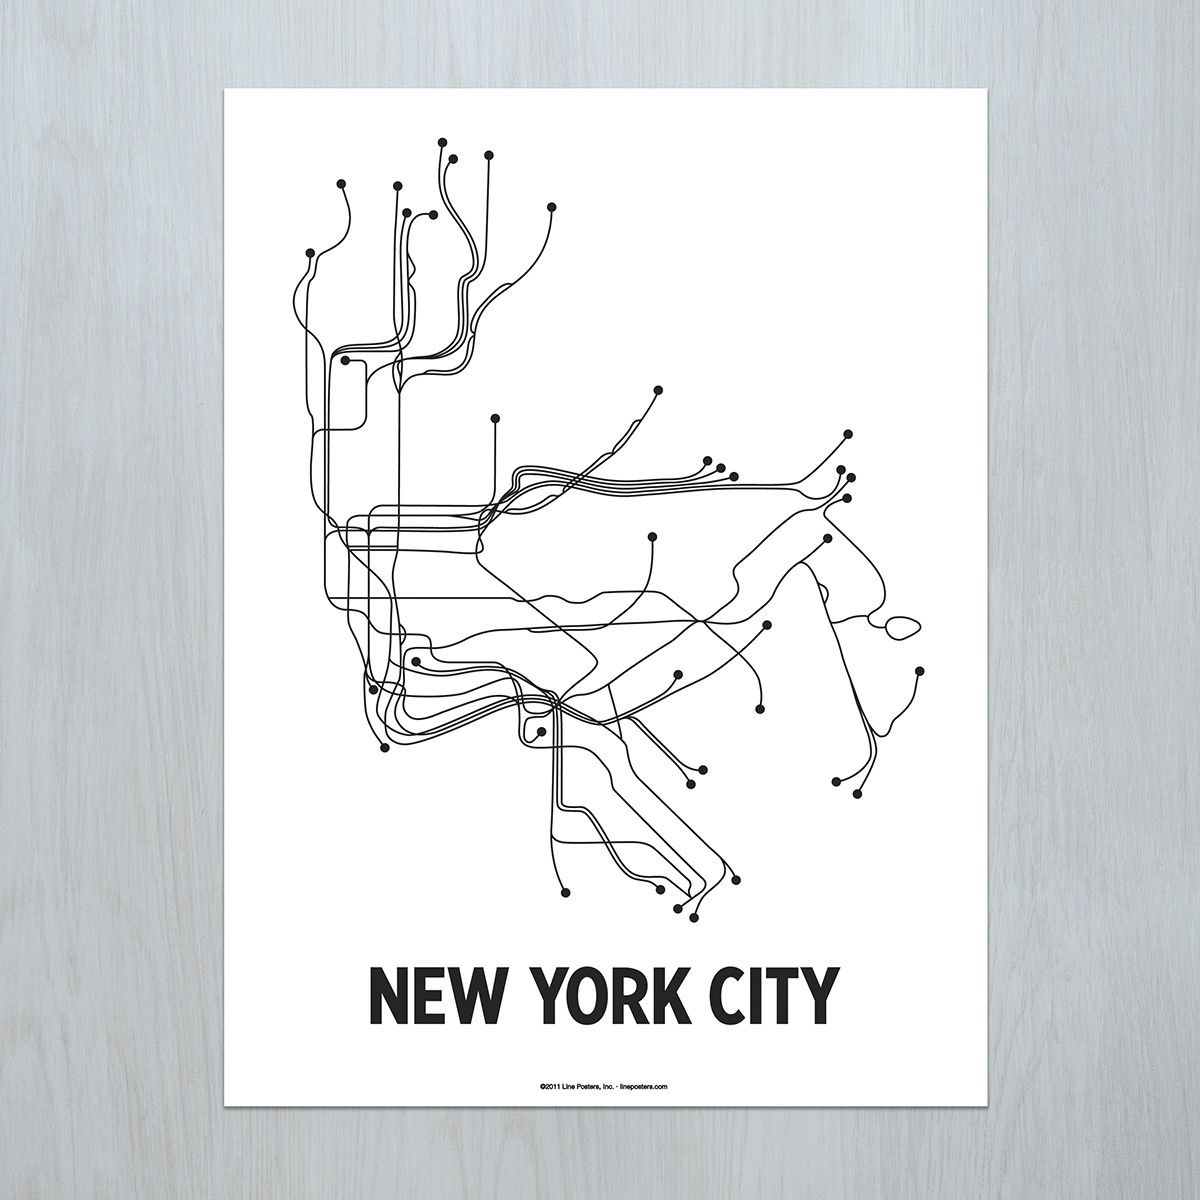 New York City Subway Map Black And White.New York City Poster Kips Bay Apartment Fixes Map Art Nyc